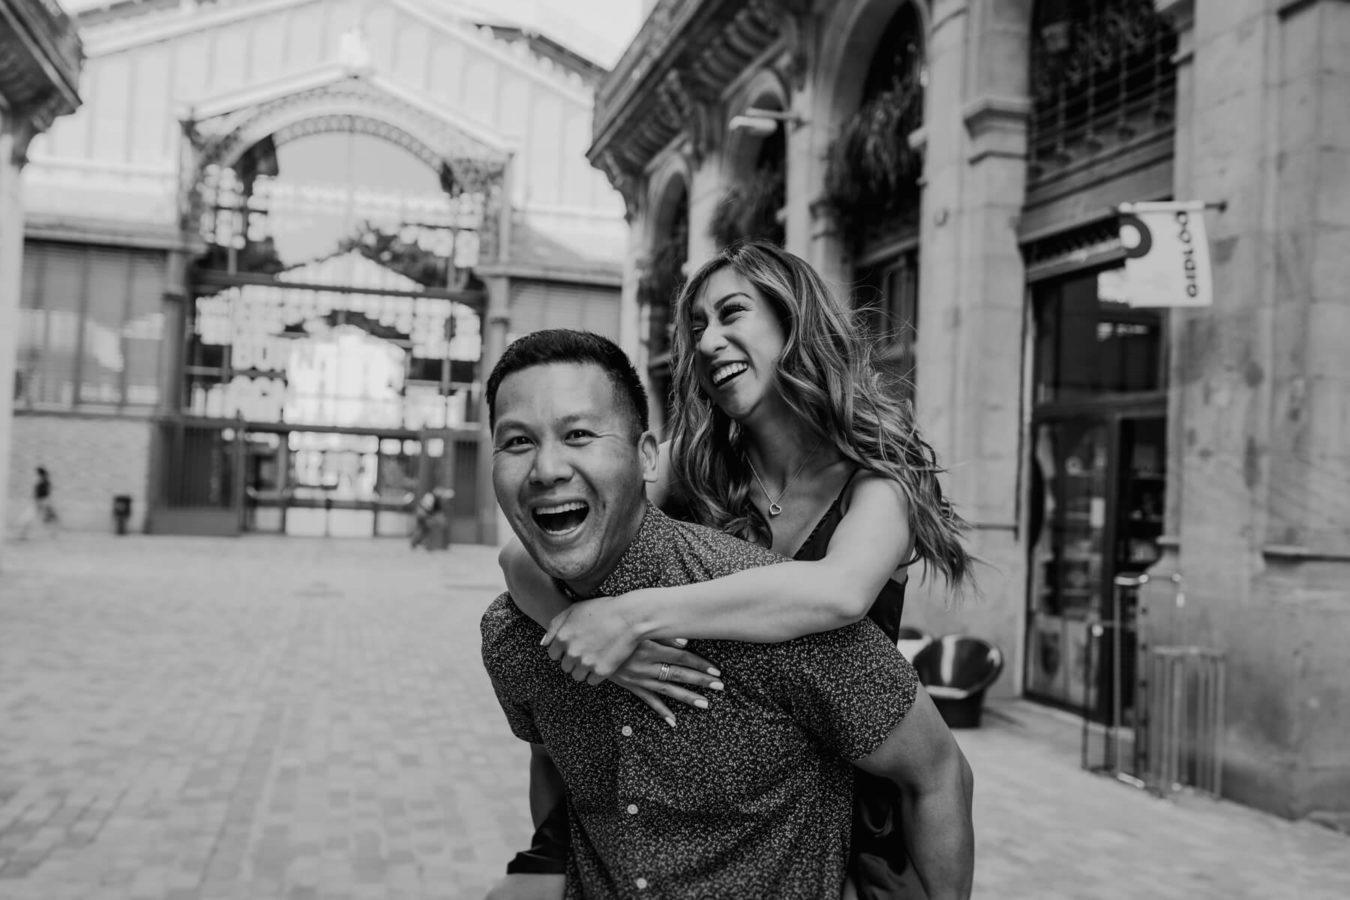 Barcelona Lovestory Engagement Photographer Anna Svobodova